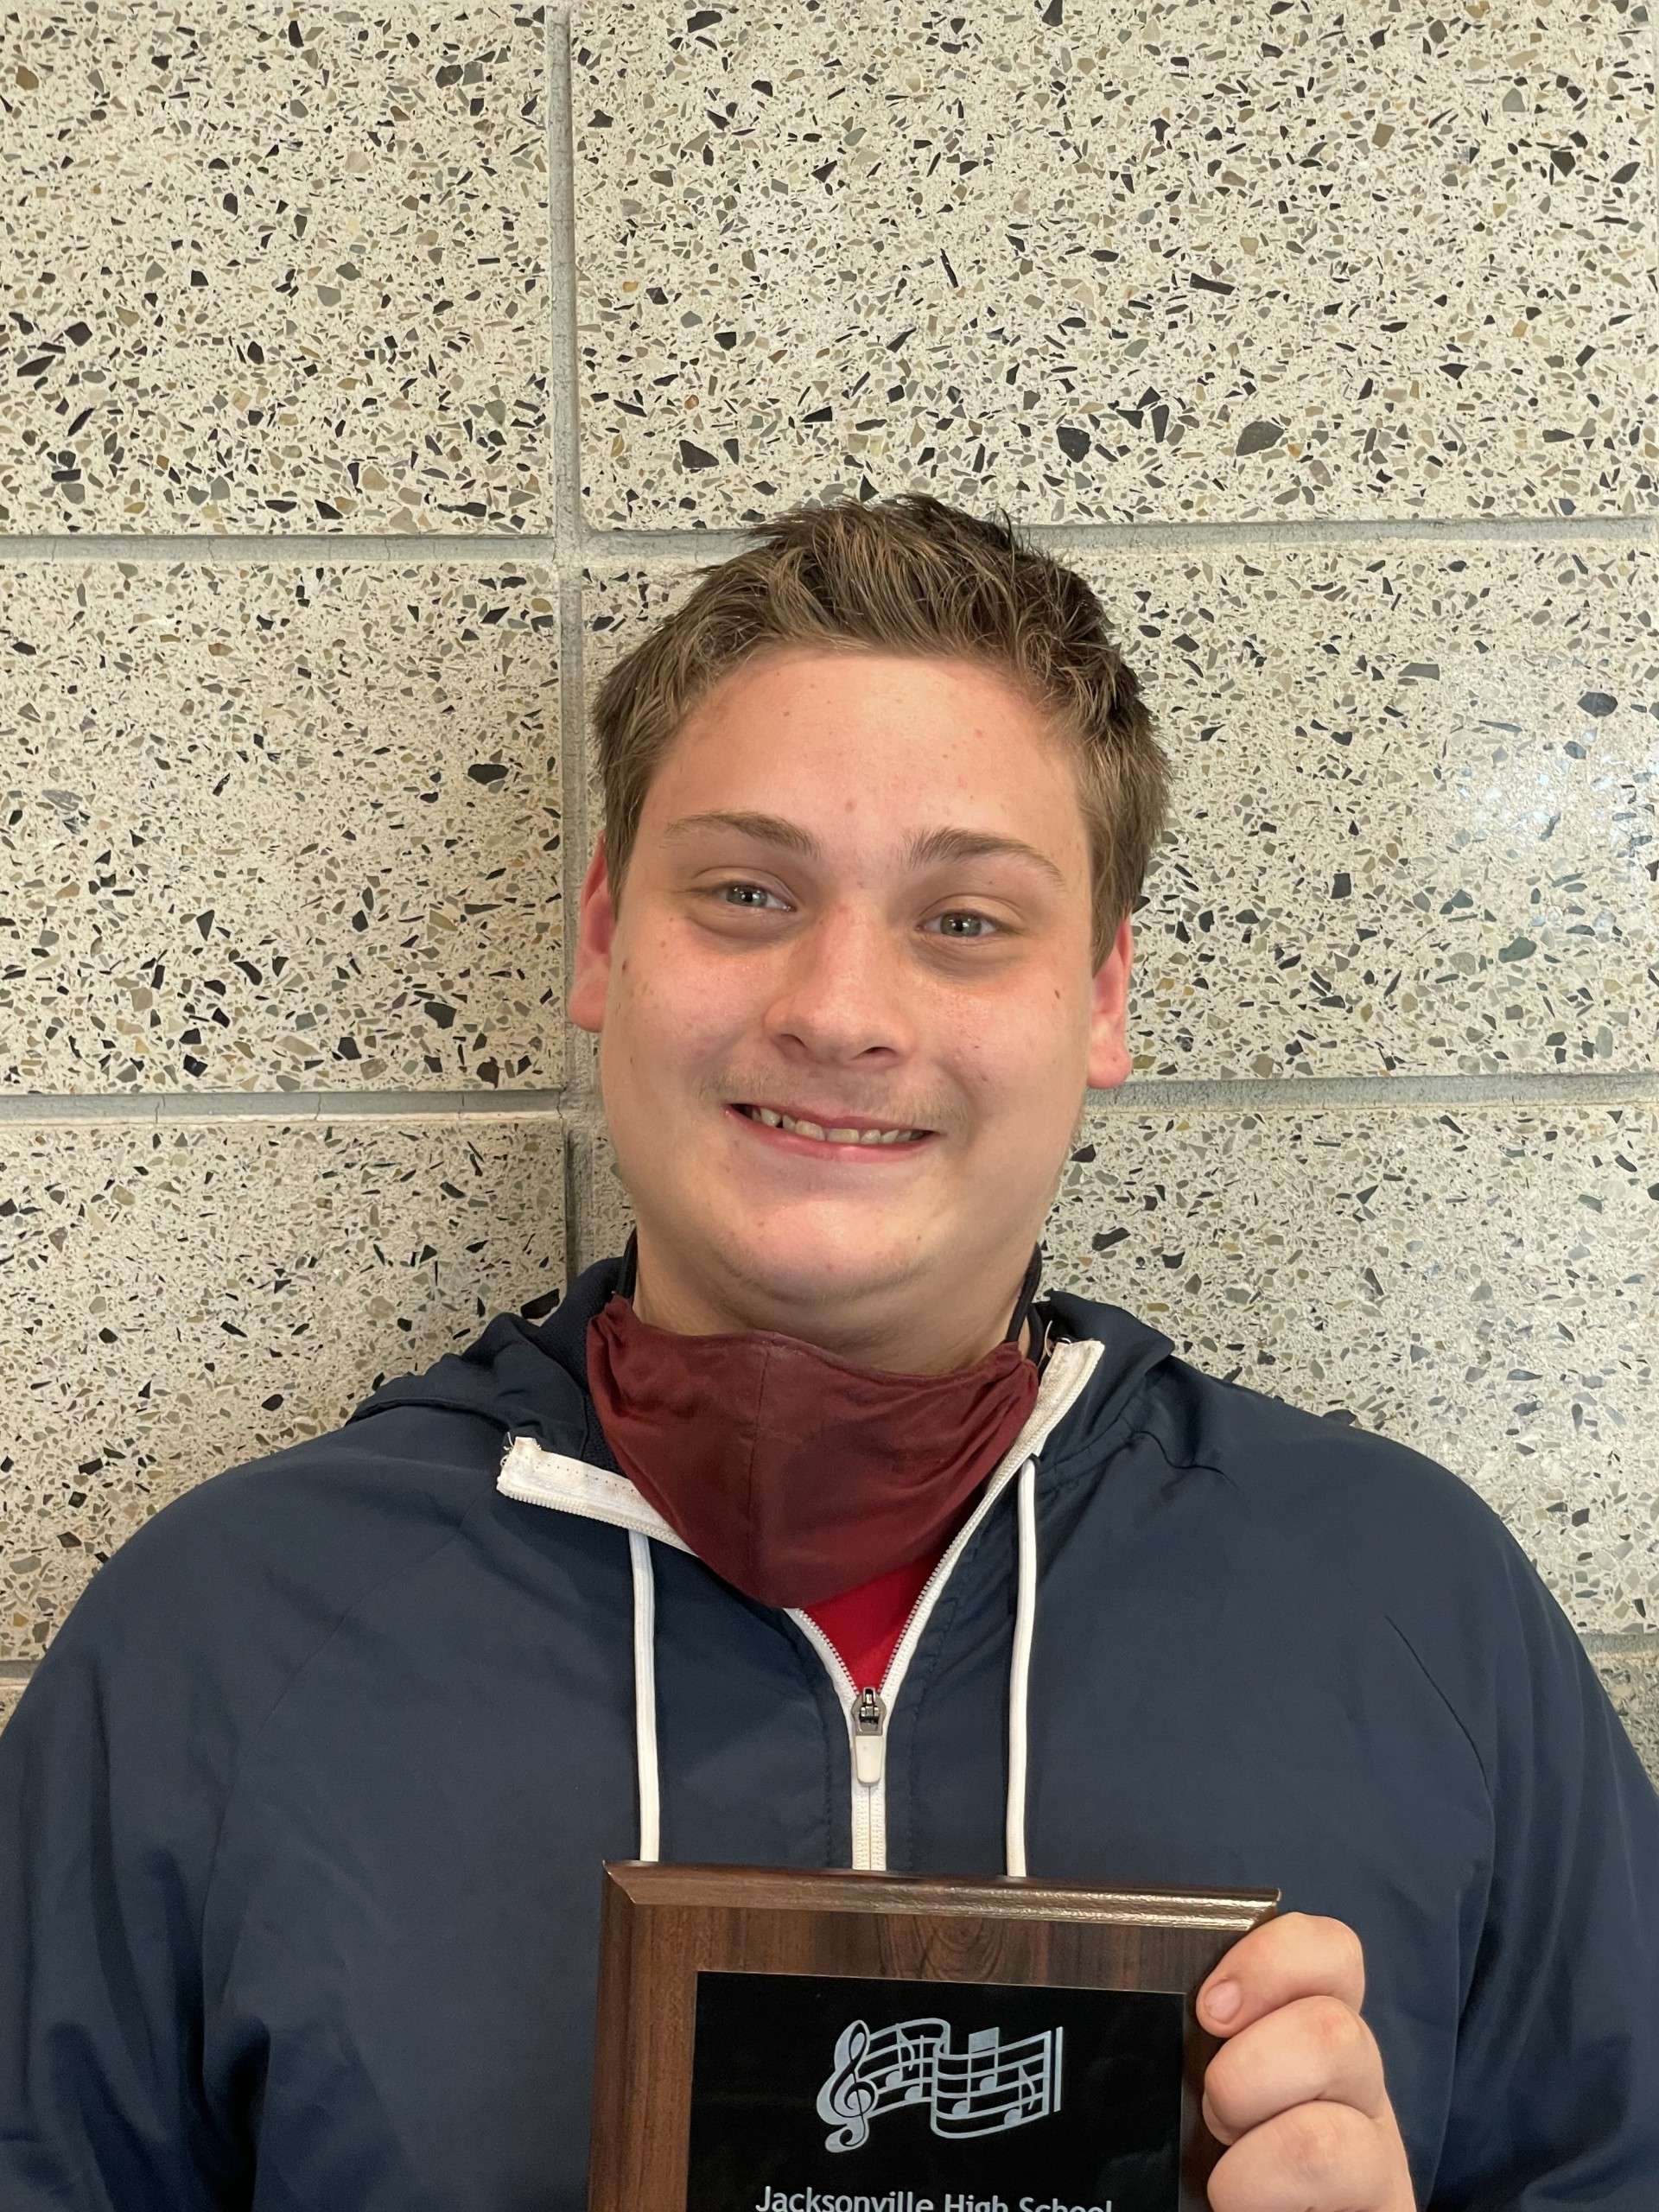 William being awarded a Senior Plaque 2020-2021 School Year